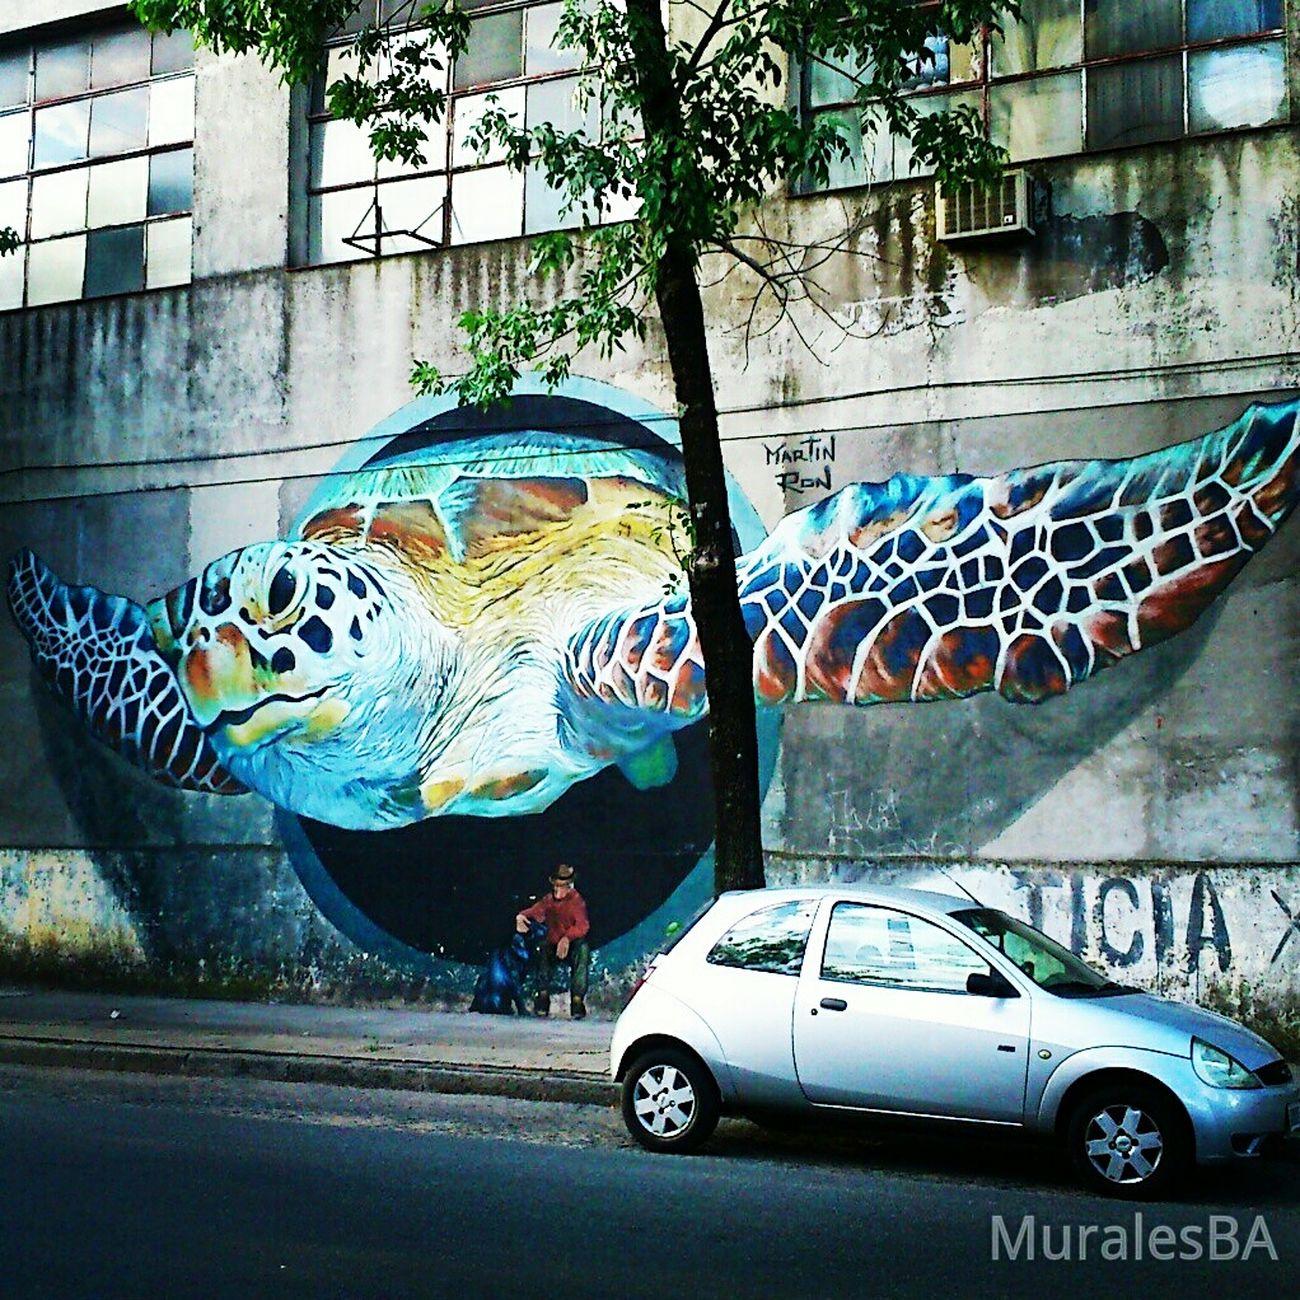 """Pedro Lujan y su perro"" por Martinron en el barrio de Barracas Buenosaires Argentina Muralesba Streetart Street Art Streetphotography The Street Photographer - 2015 EyeEm Awards Mural ArtWork Art Graffiti Streetarg"